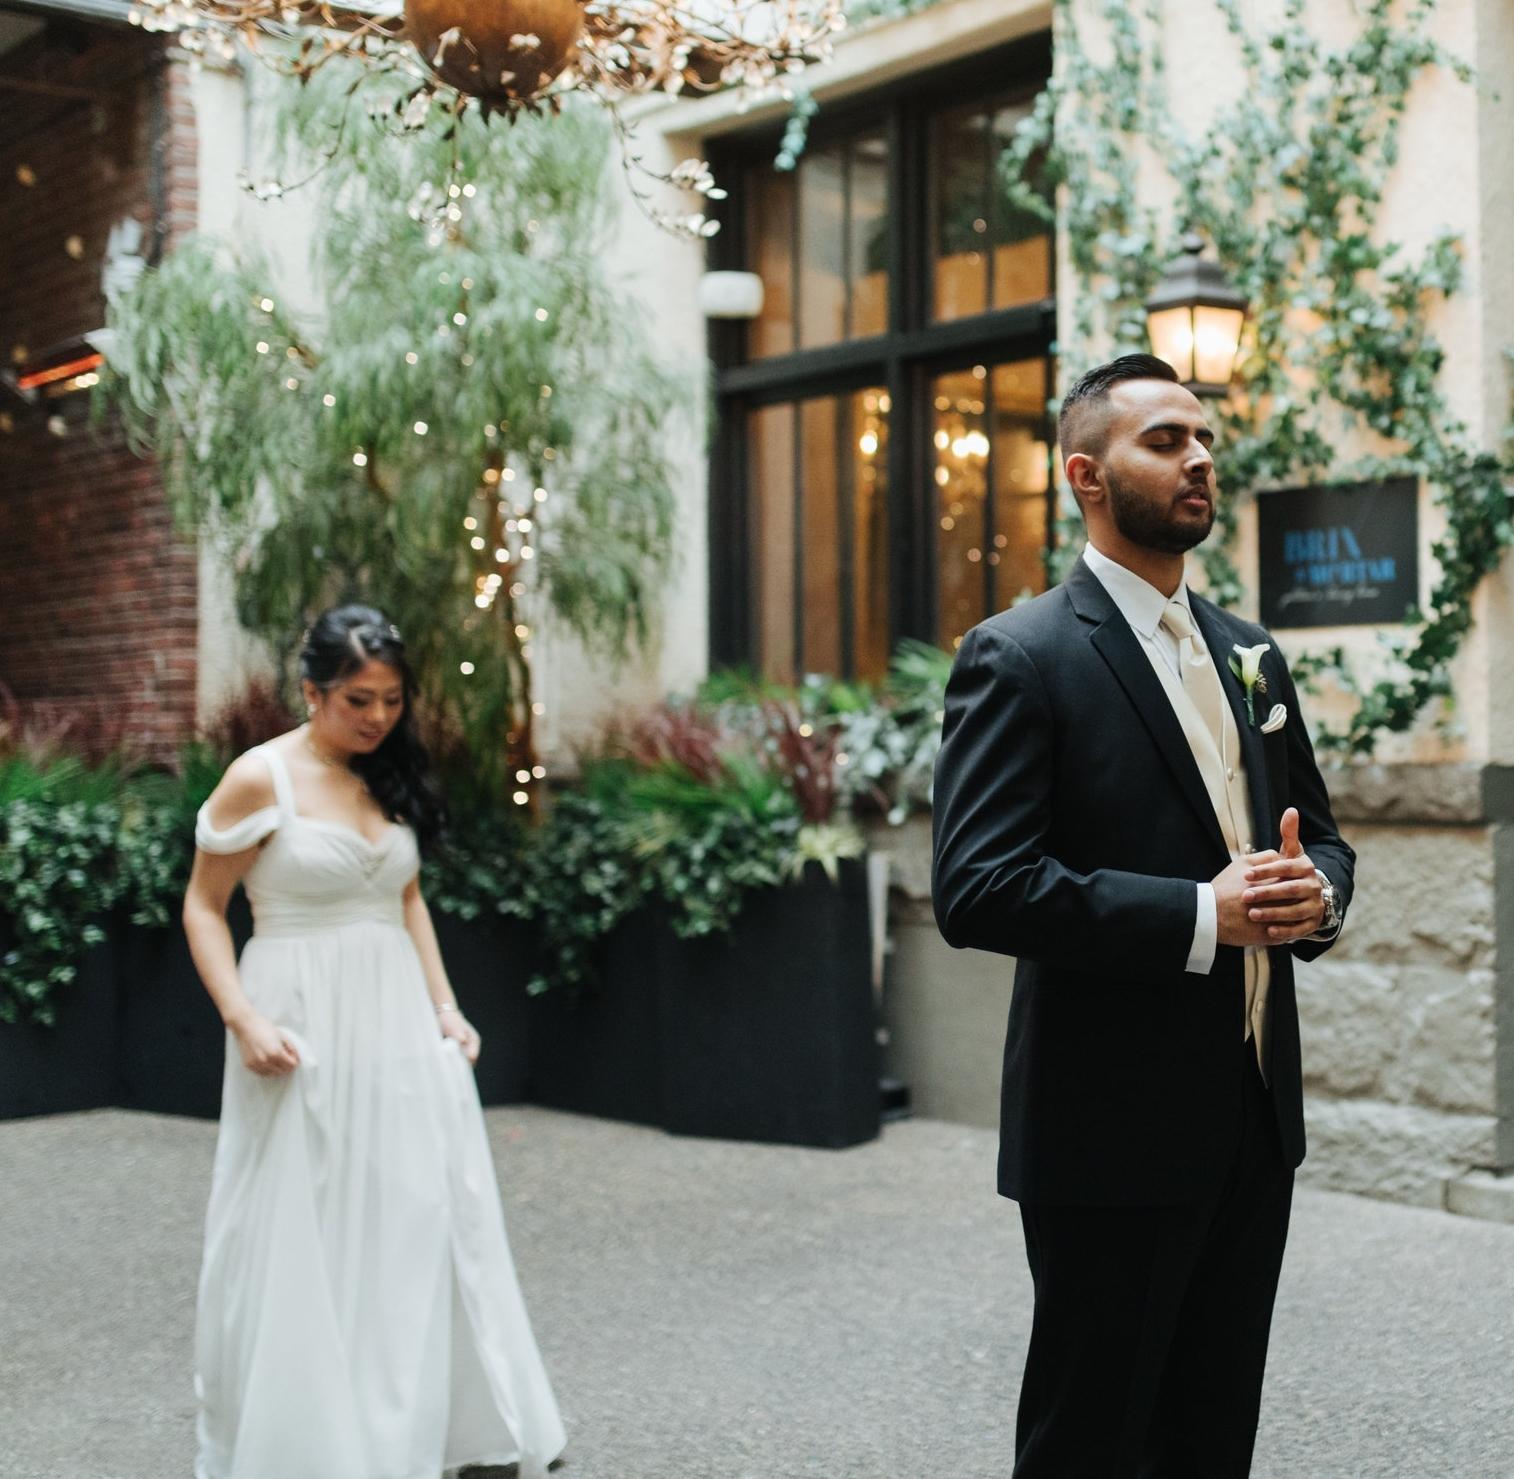 herastudios_wedding1_danica_sanjeev_collectors_package-26.jpg